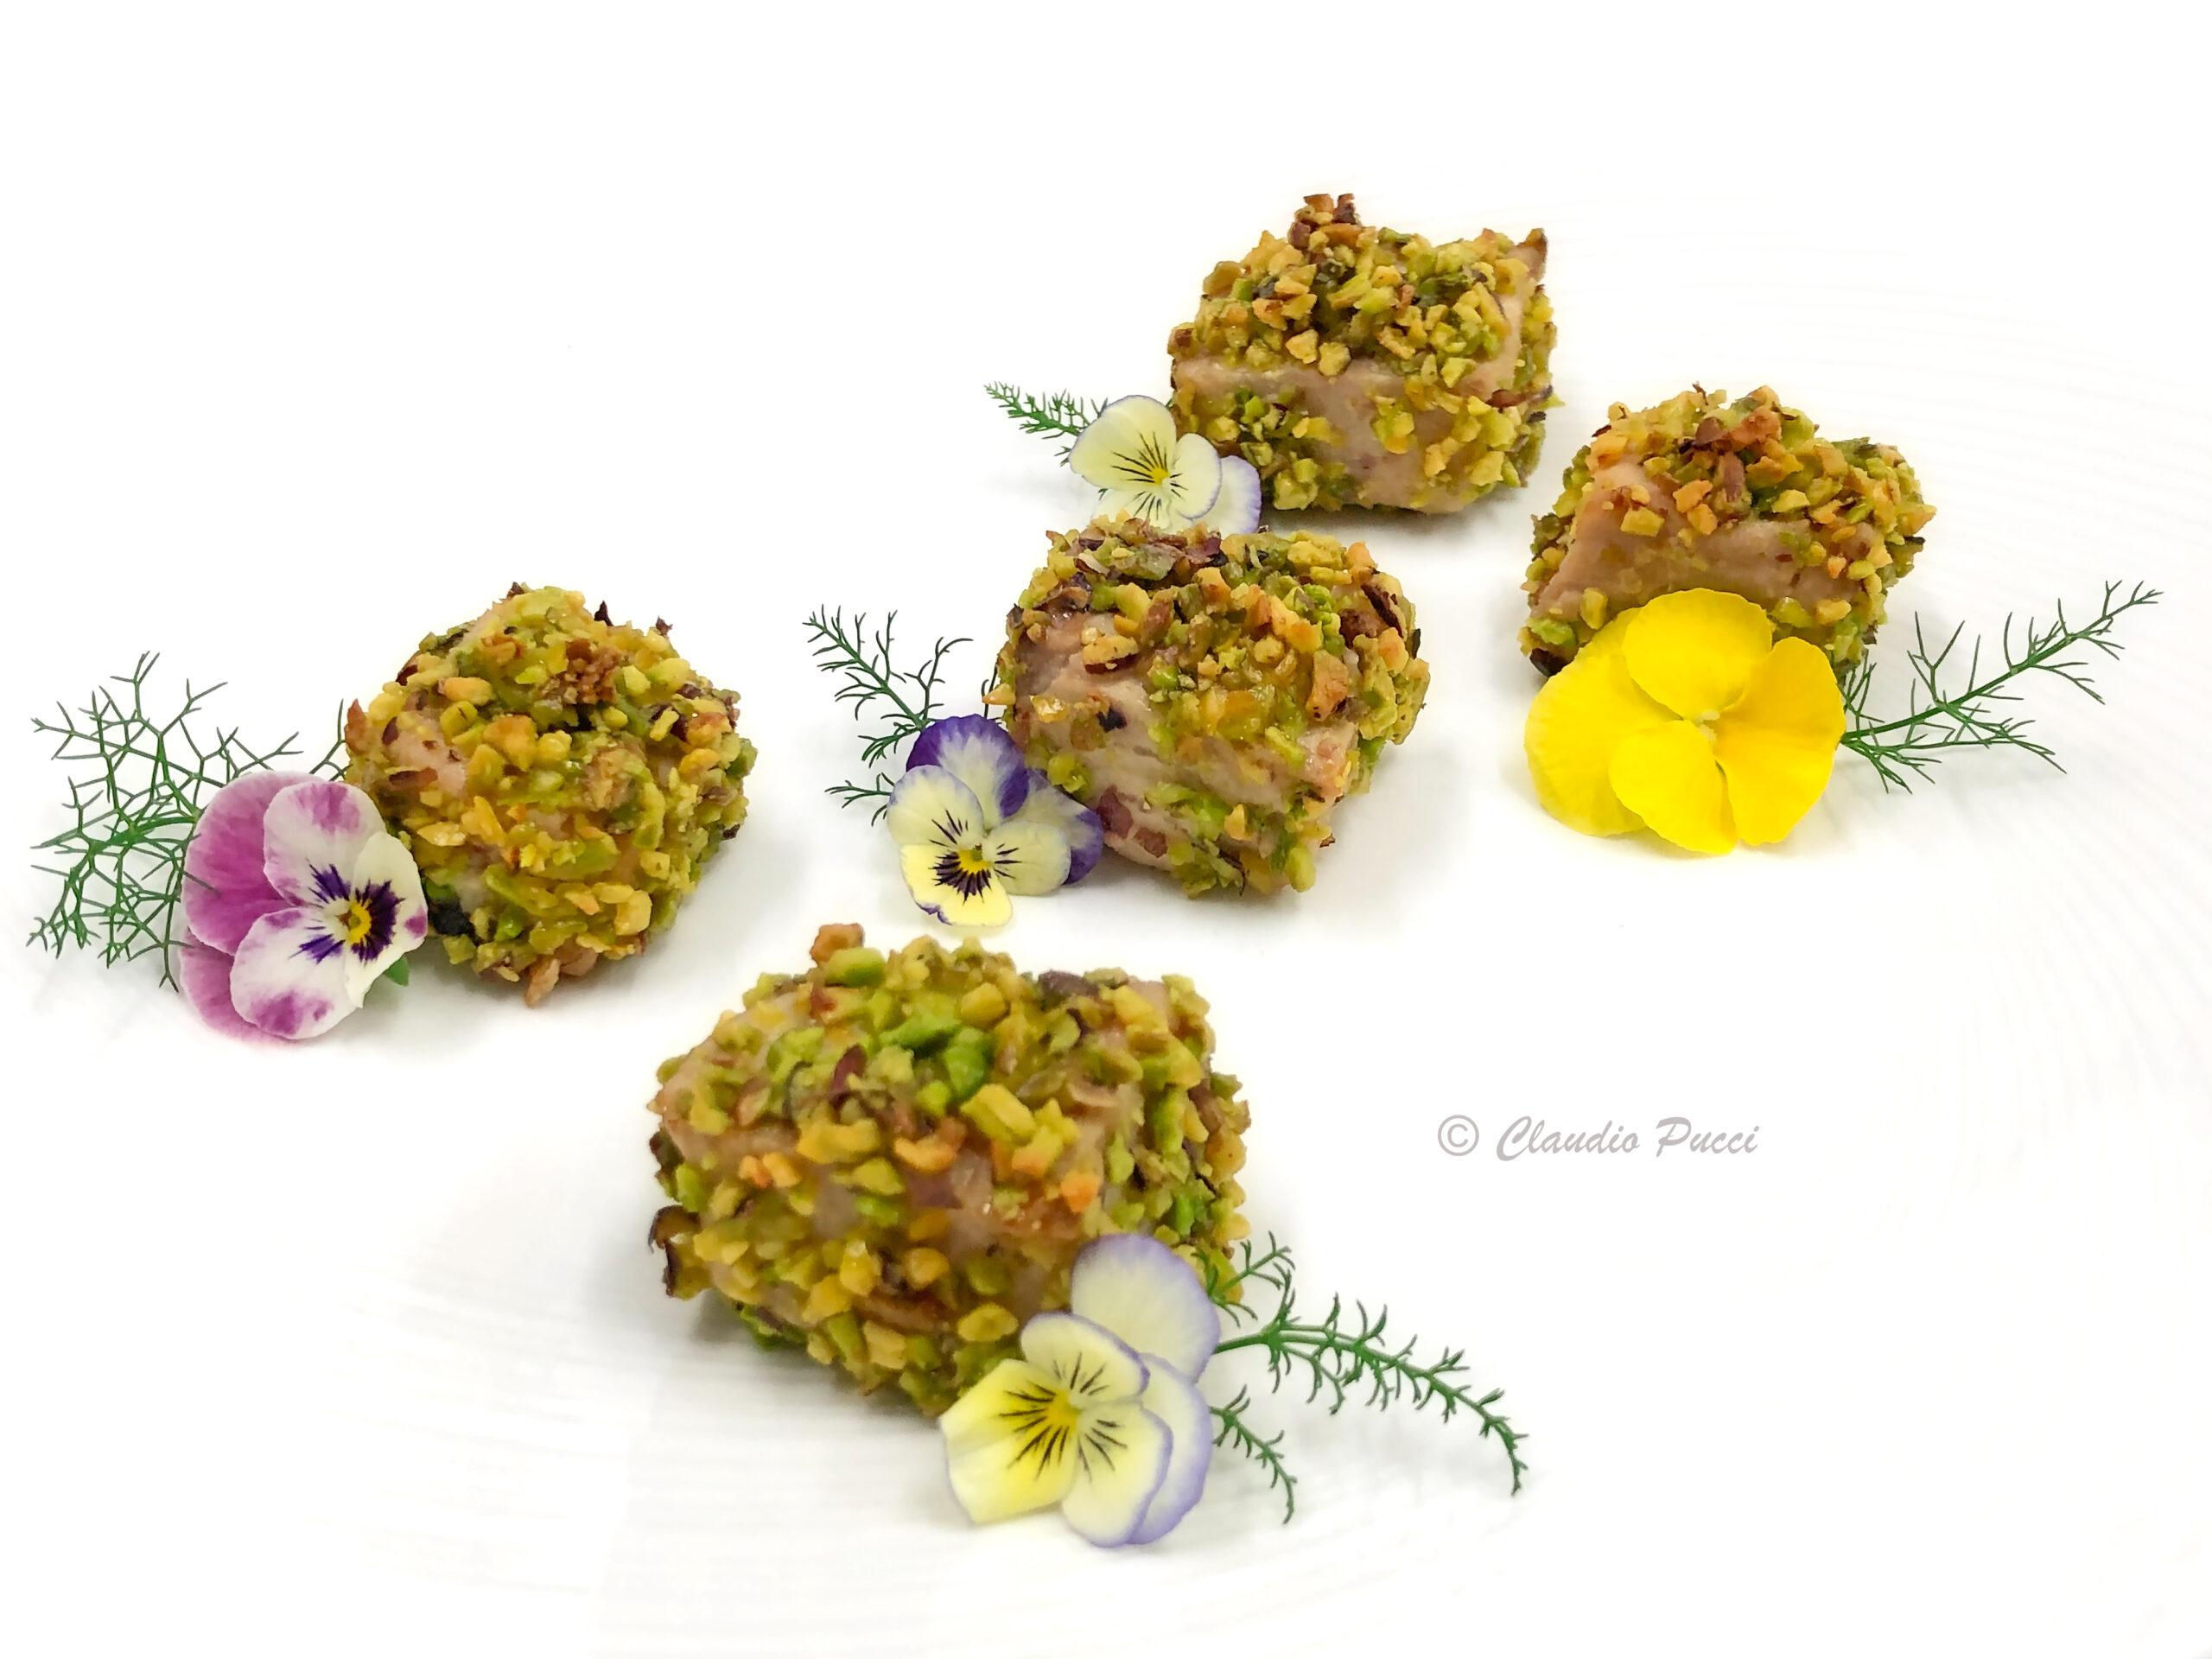 Bocconcini di pesce spada in crosta di pistacchio